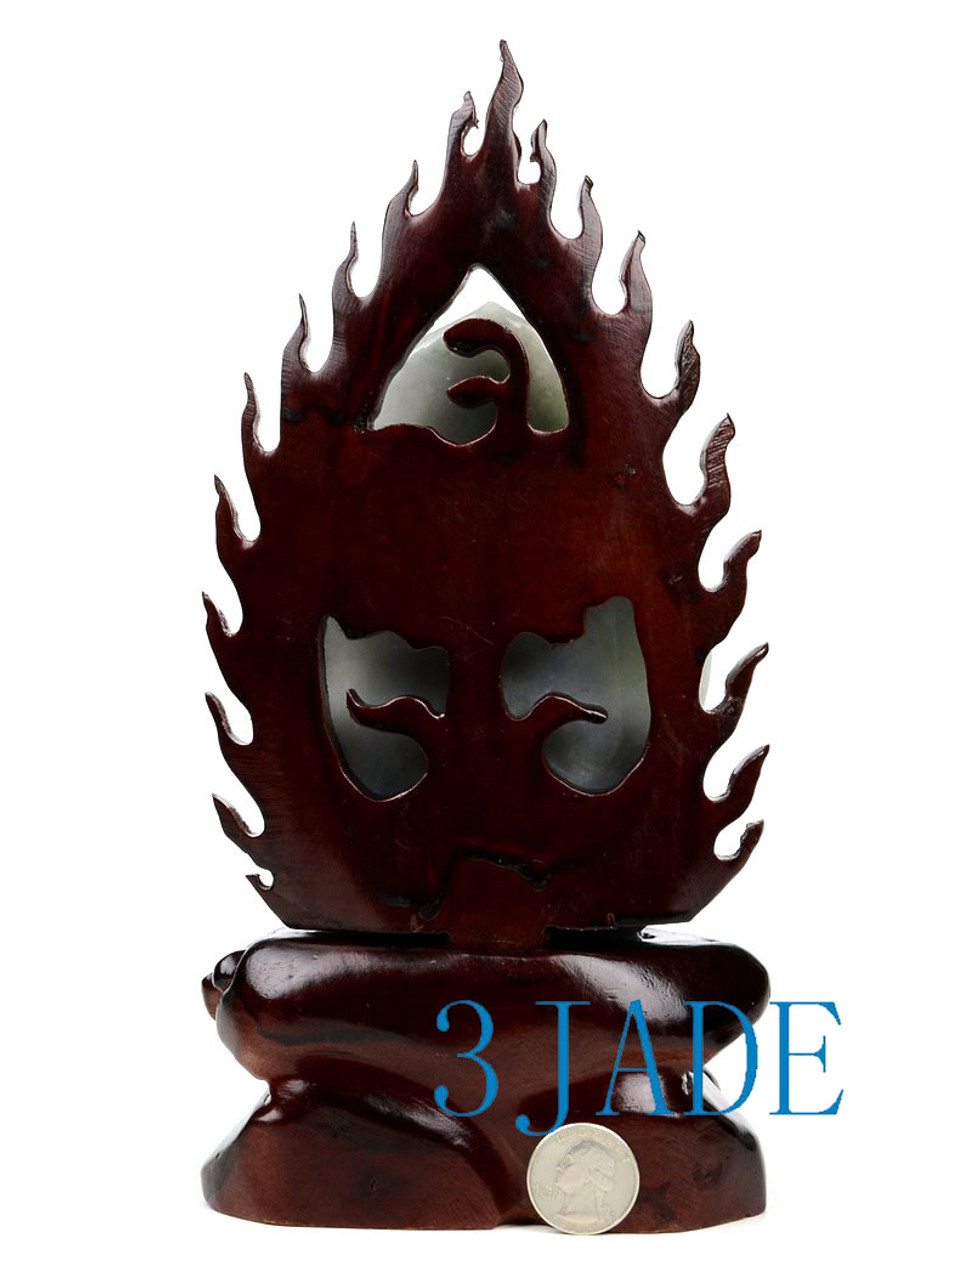 A Grade Multi-color Natural Jadeite Jade Kwan Yin / Guanyin Statue Sculpture w/ certificate